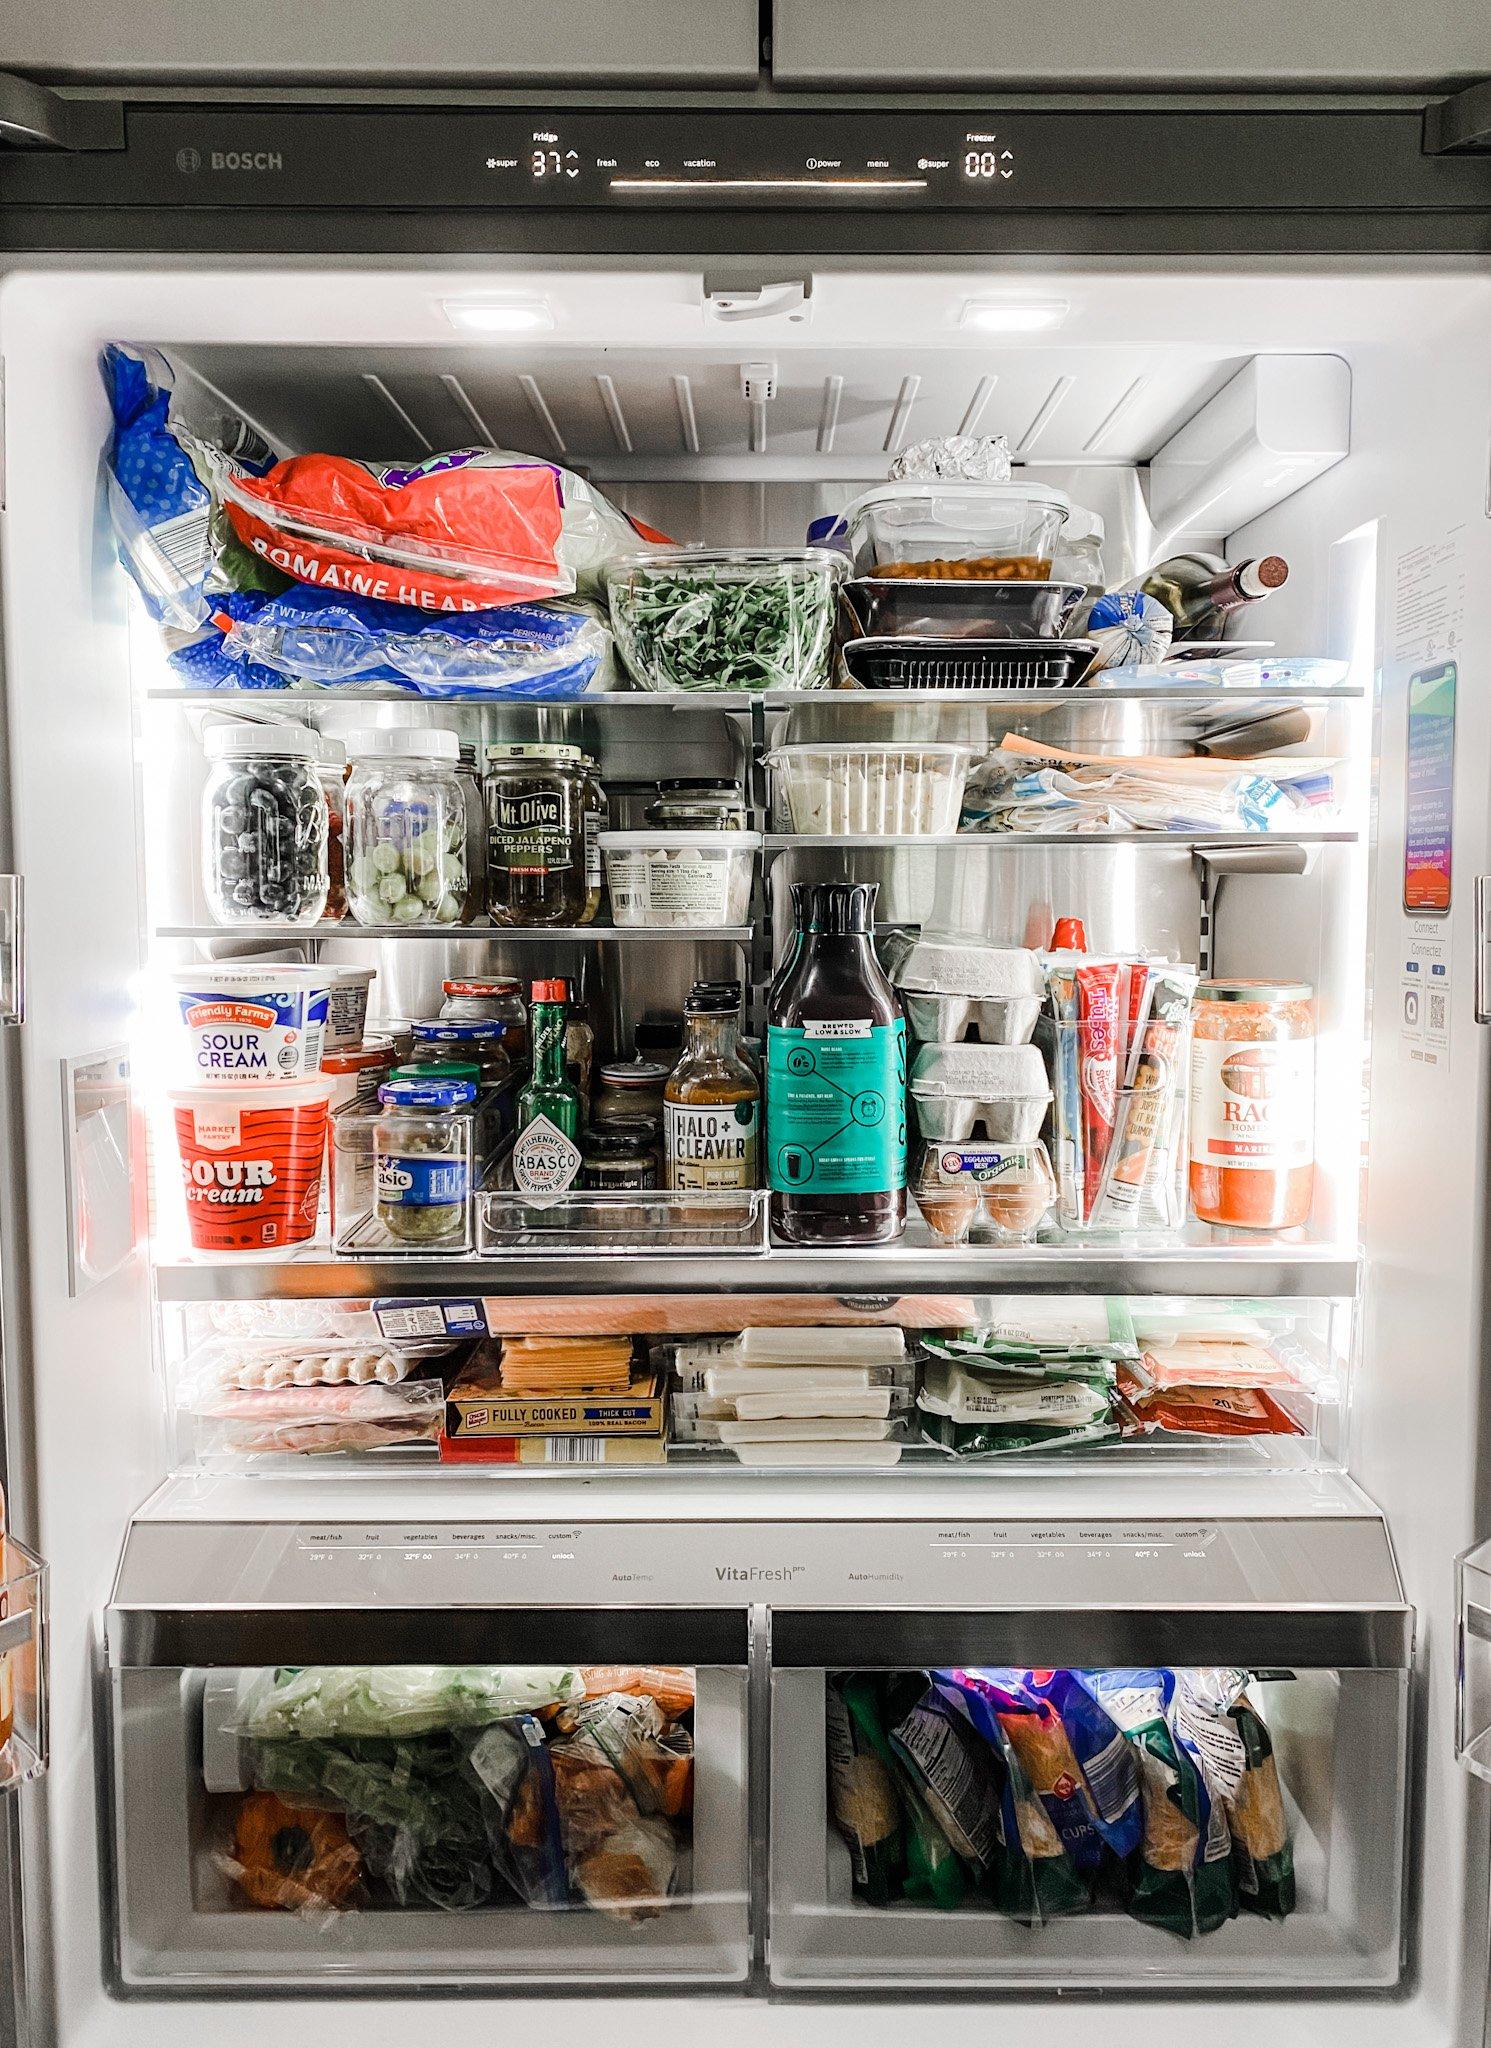 family-friendly fridge from Bosch